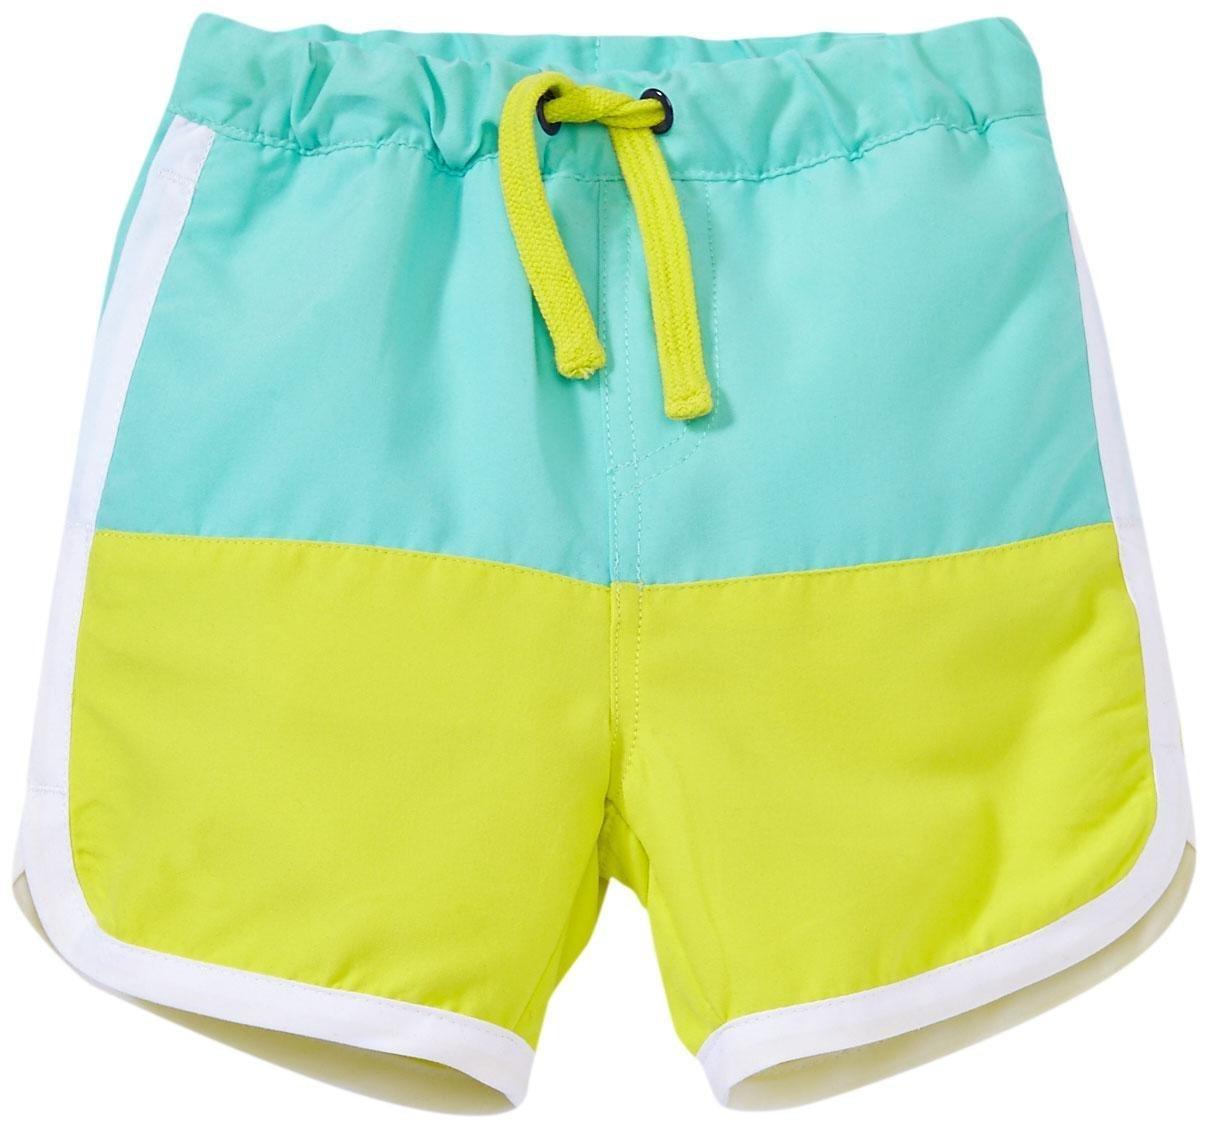 Egg by Susan Lazar Boys' Color Block Swim Shorts, Aqua, 12 Months by Egg by Susan Lazar